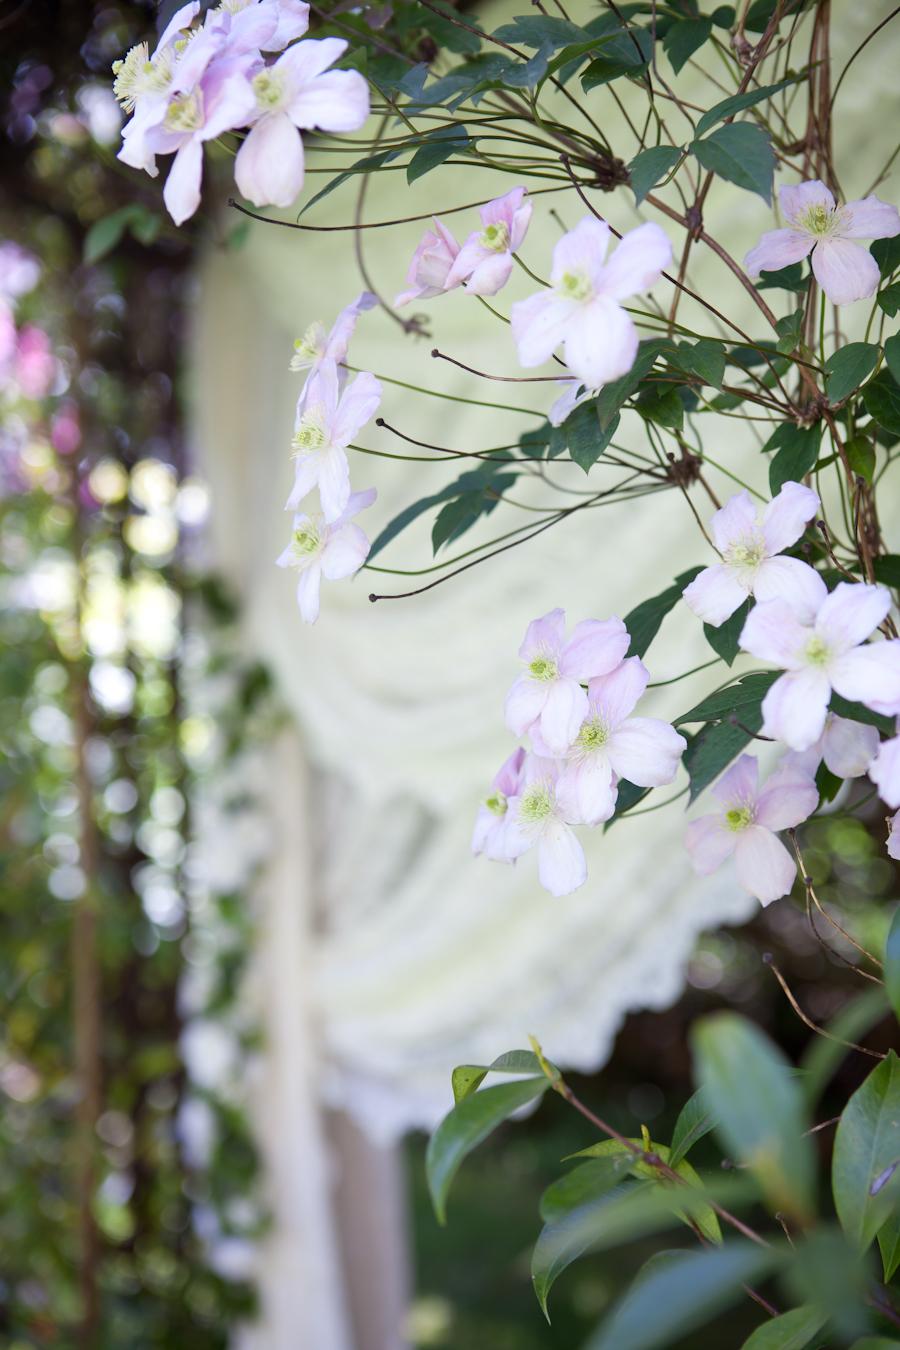 Arbour flowers at Villa Marco Polo Inn